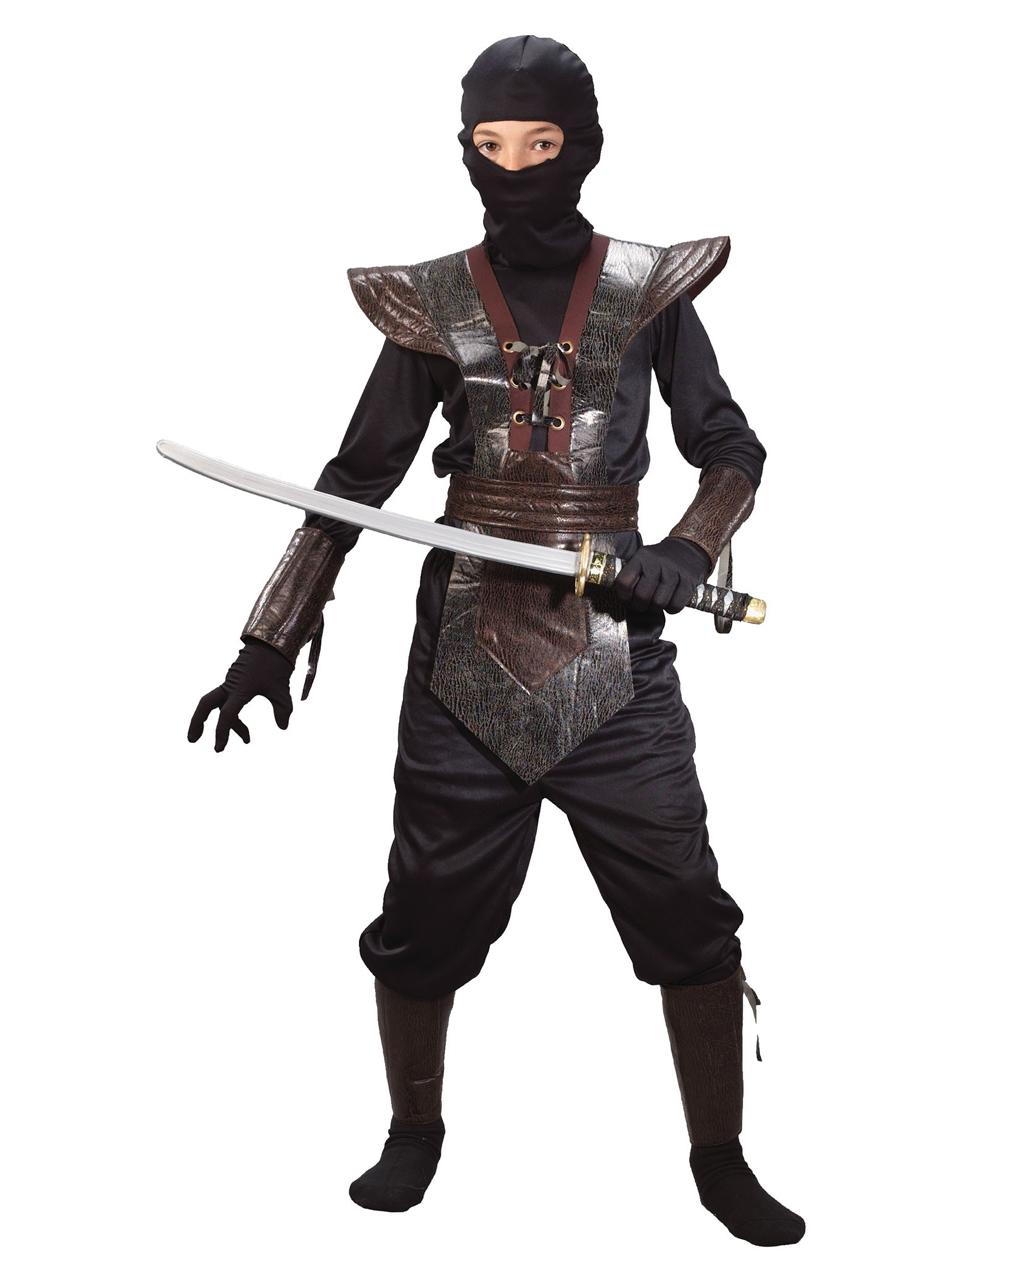 Ninja Kit Nunchaku and 2 Daggers for Halloween Costume Samaurai Fighter NEW